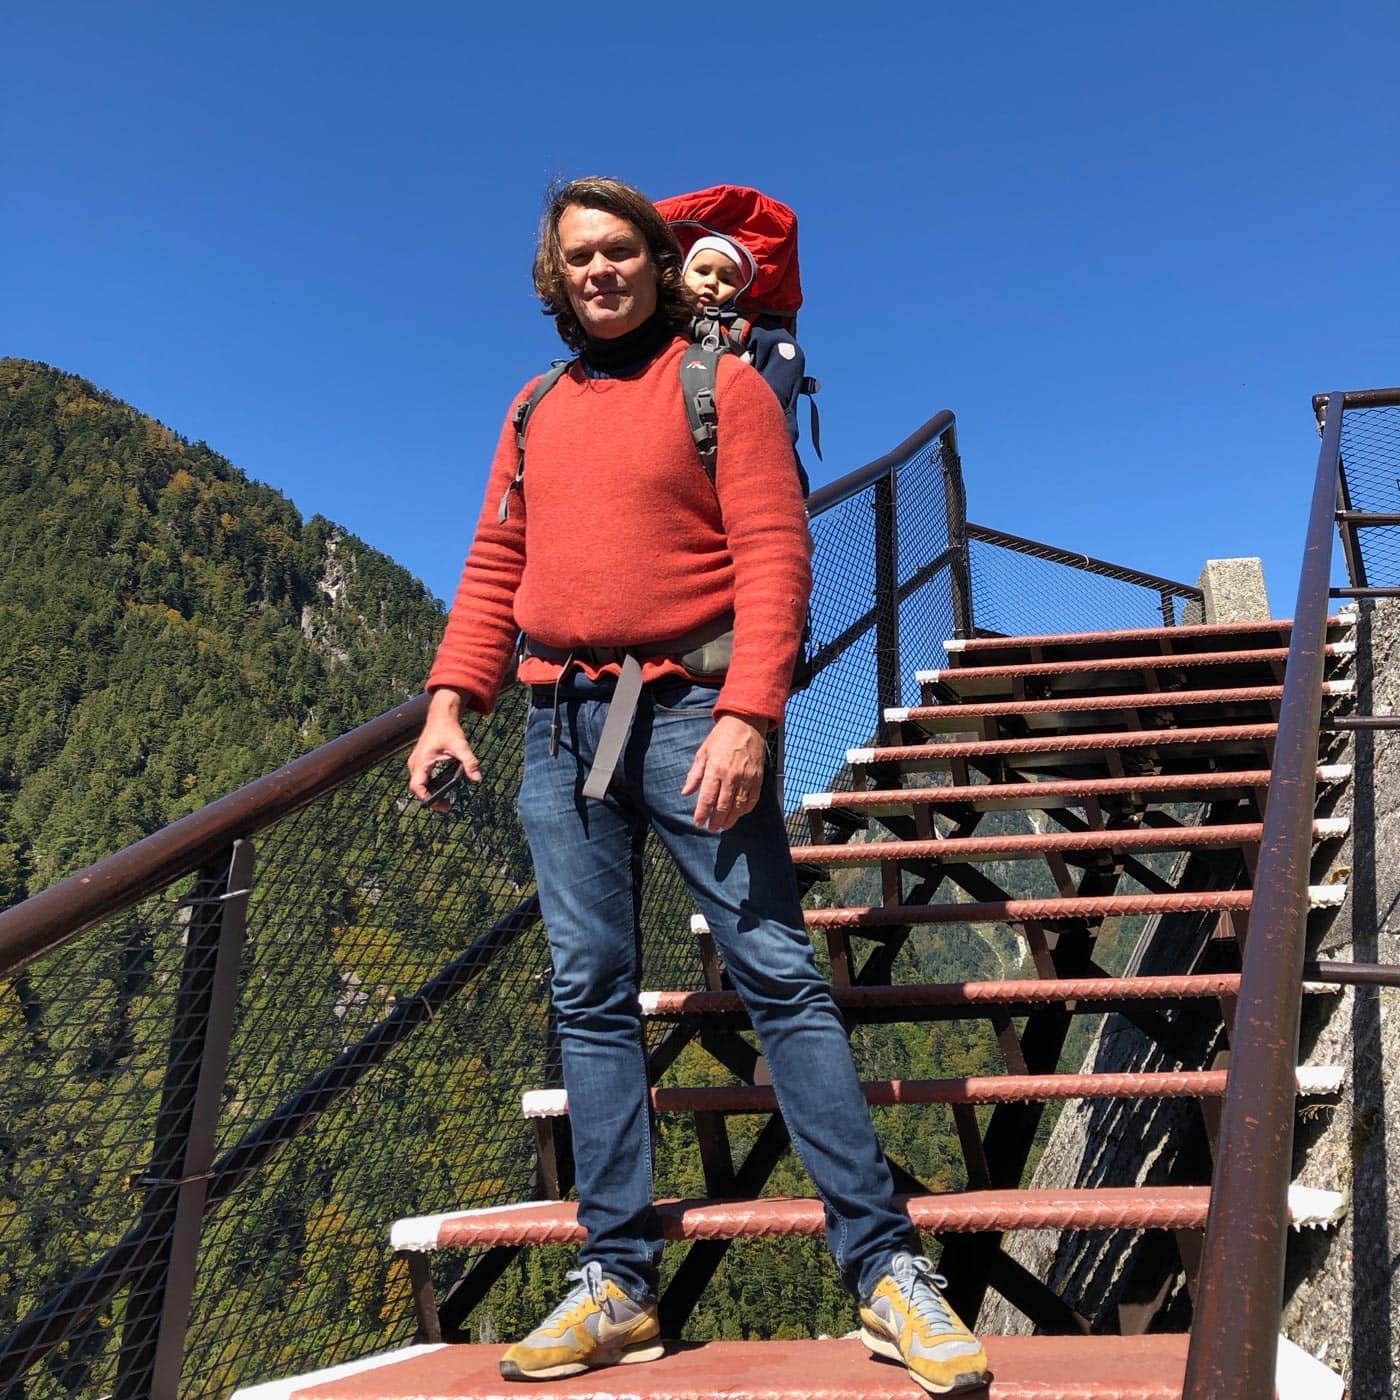 Wandern in den japanischen Alpen mit Baby // HIMBEER